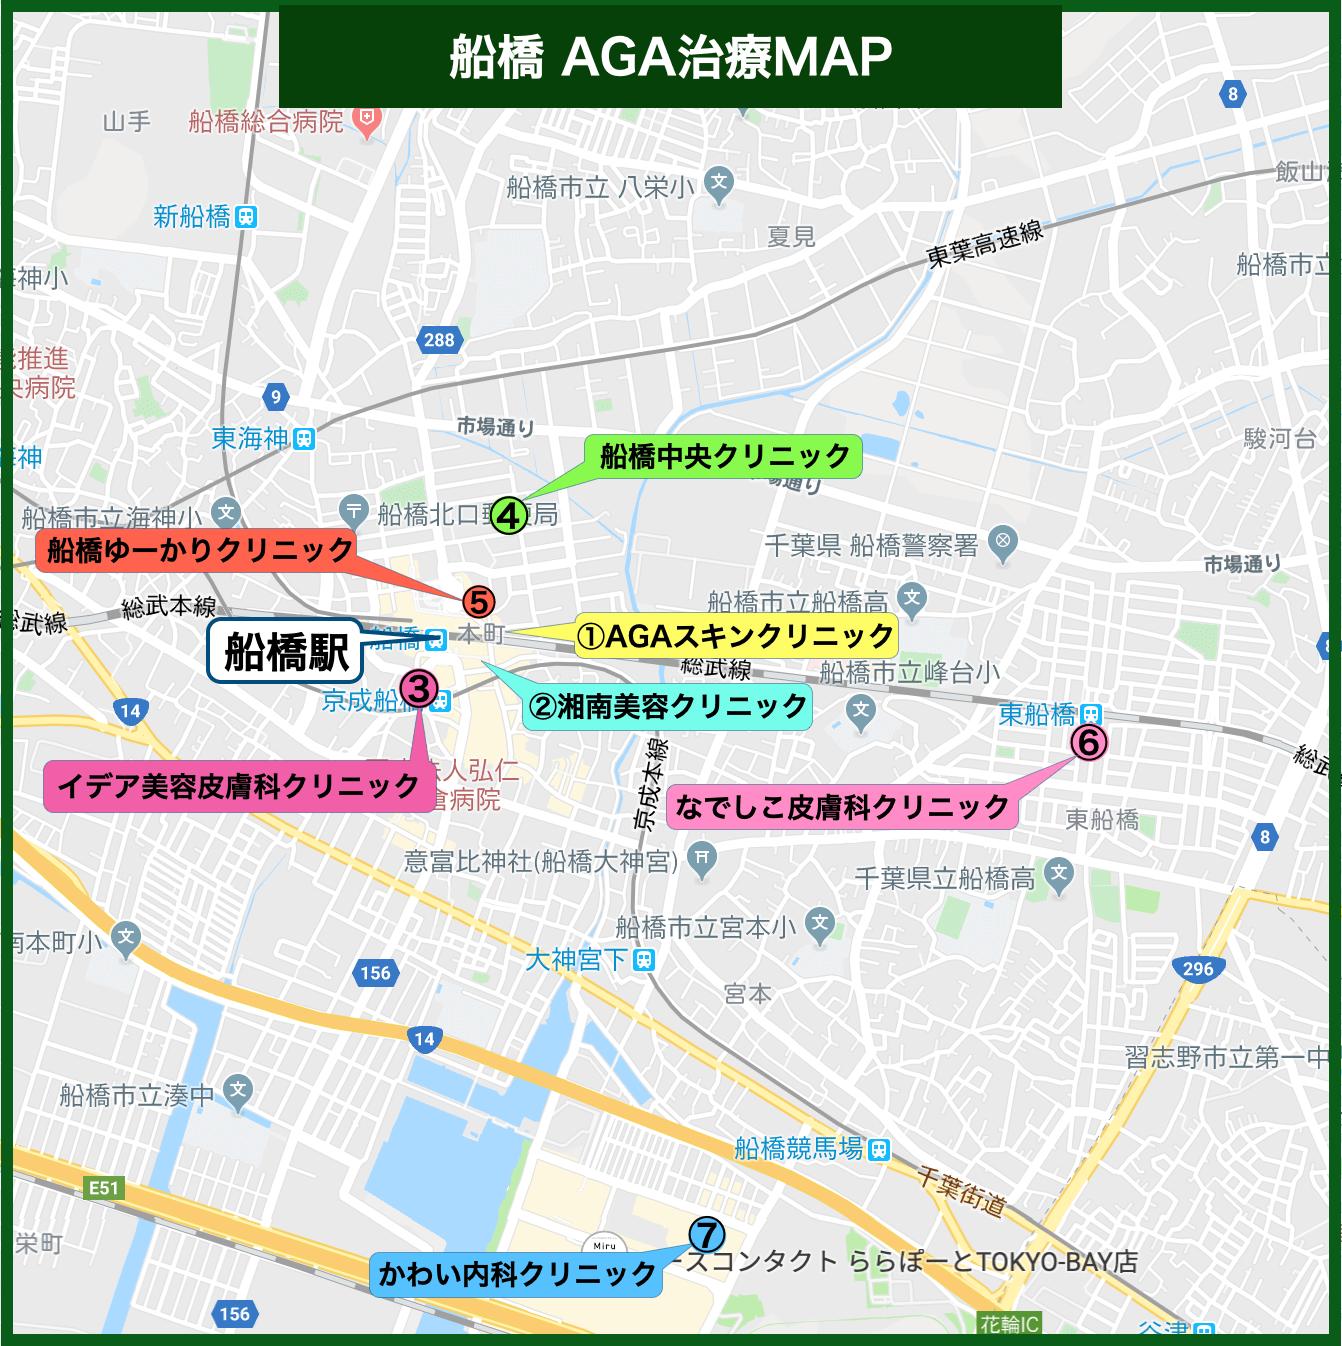 船橋 AGA治療MAP